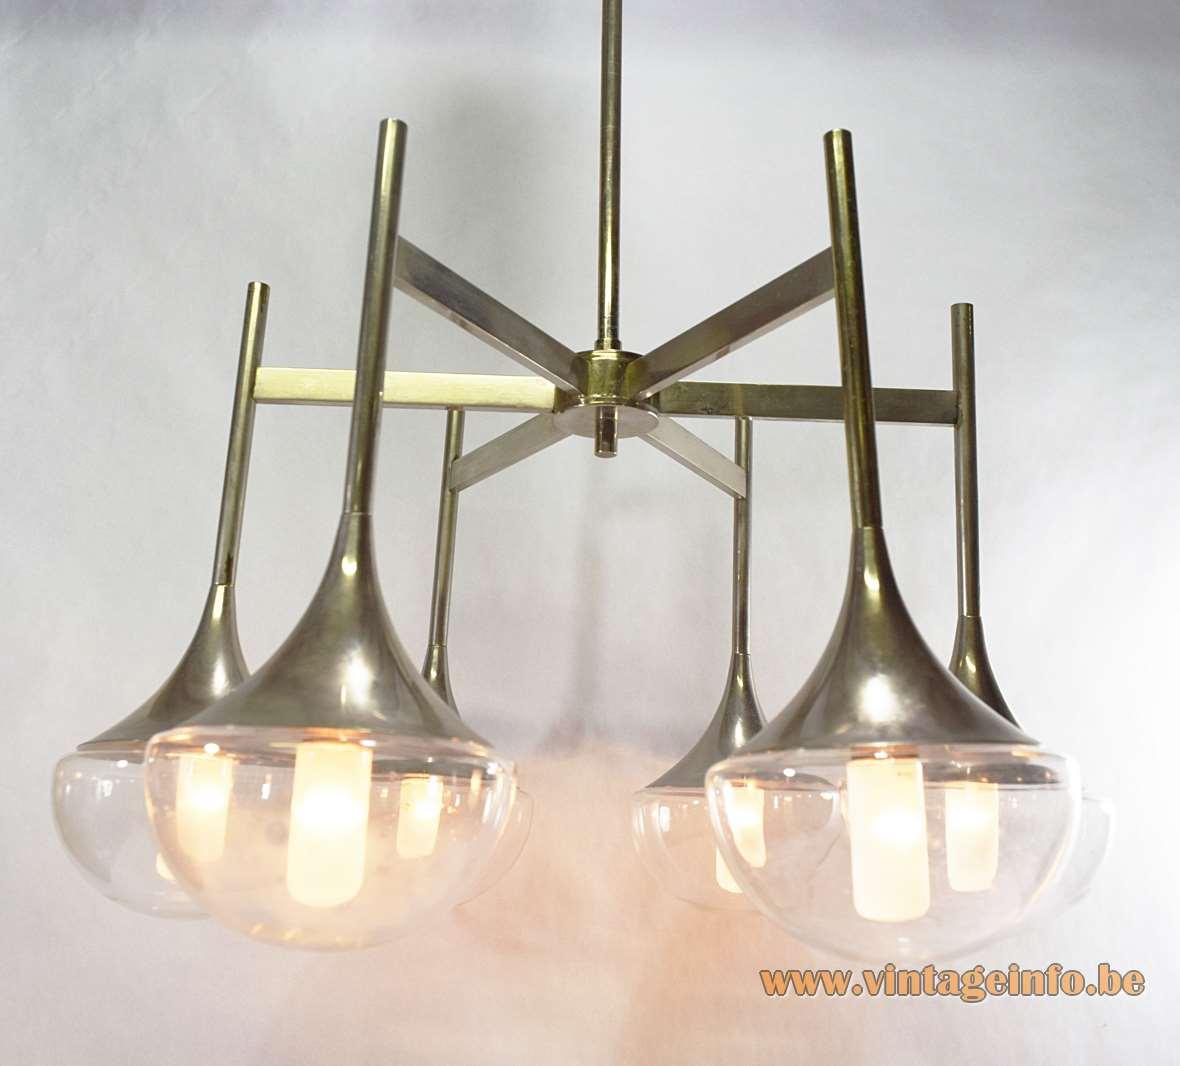 Gaetano Sciolari trumpet chandelier chrome rods & slats 6 half round glass globes Boulanger Belgium 1960s 1970s